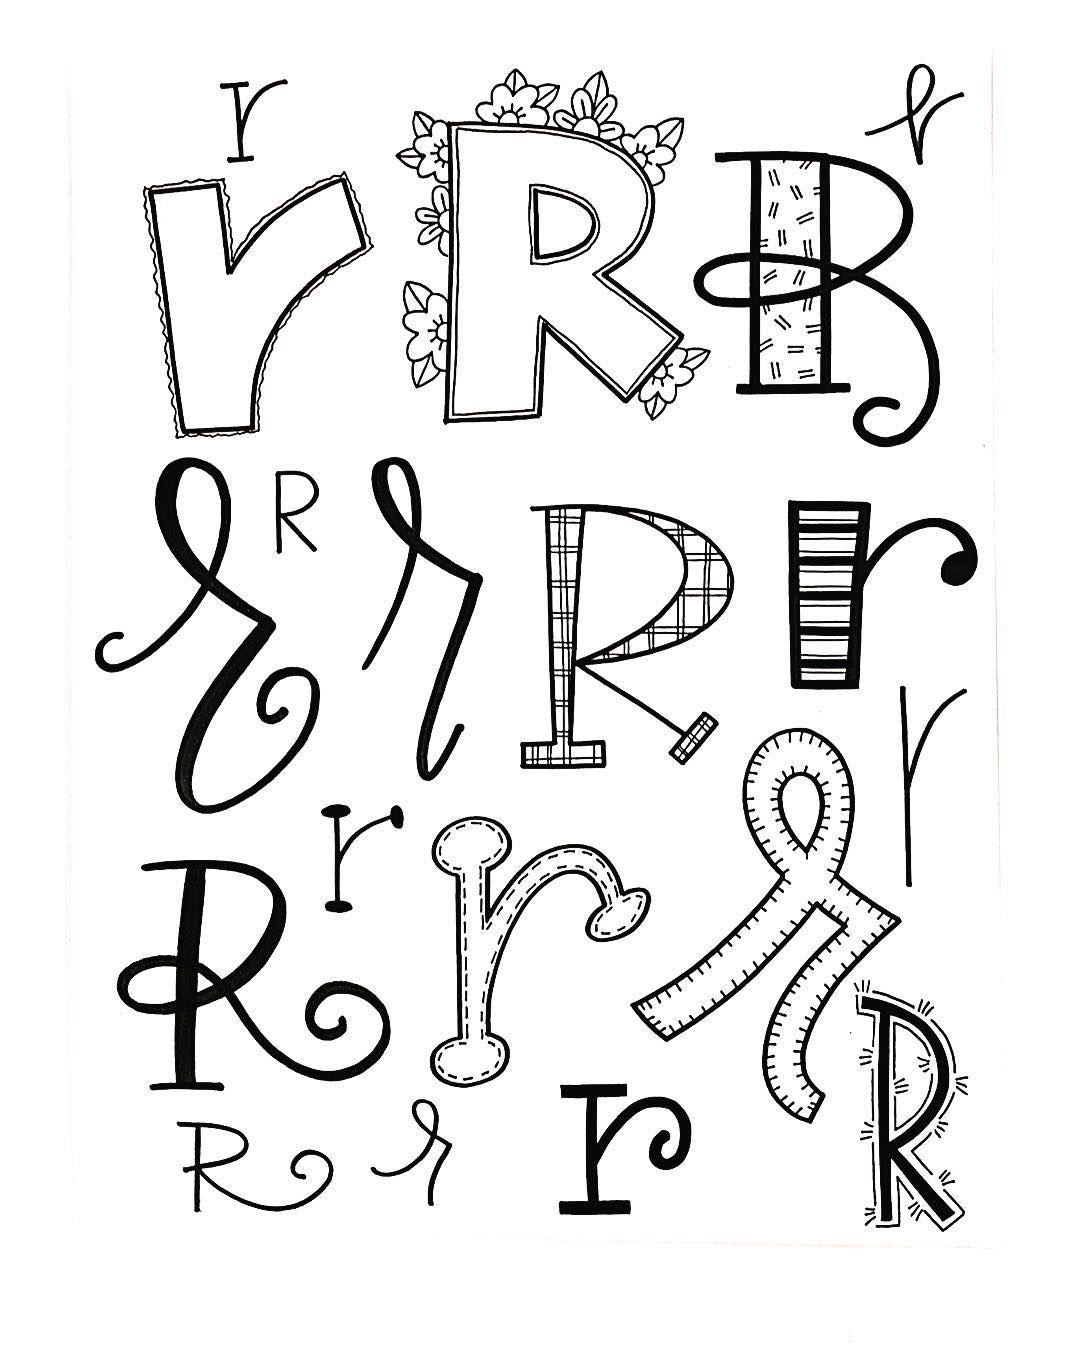 Letter R Handletteredabcs Handletteredabcs AbcsR